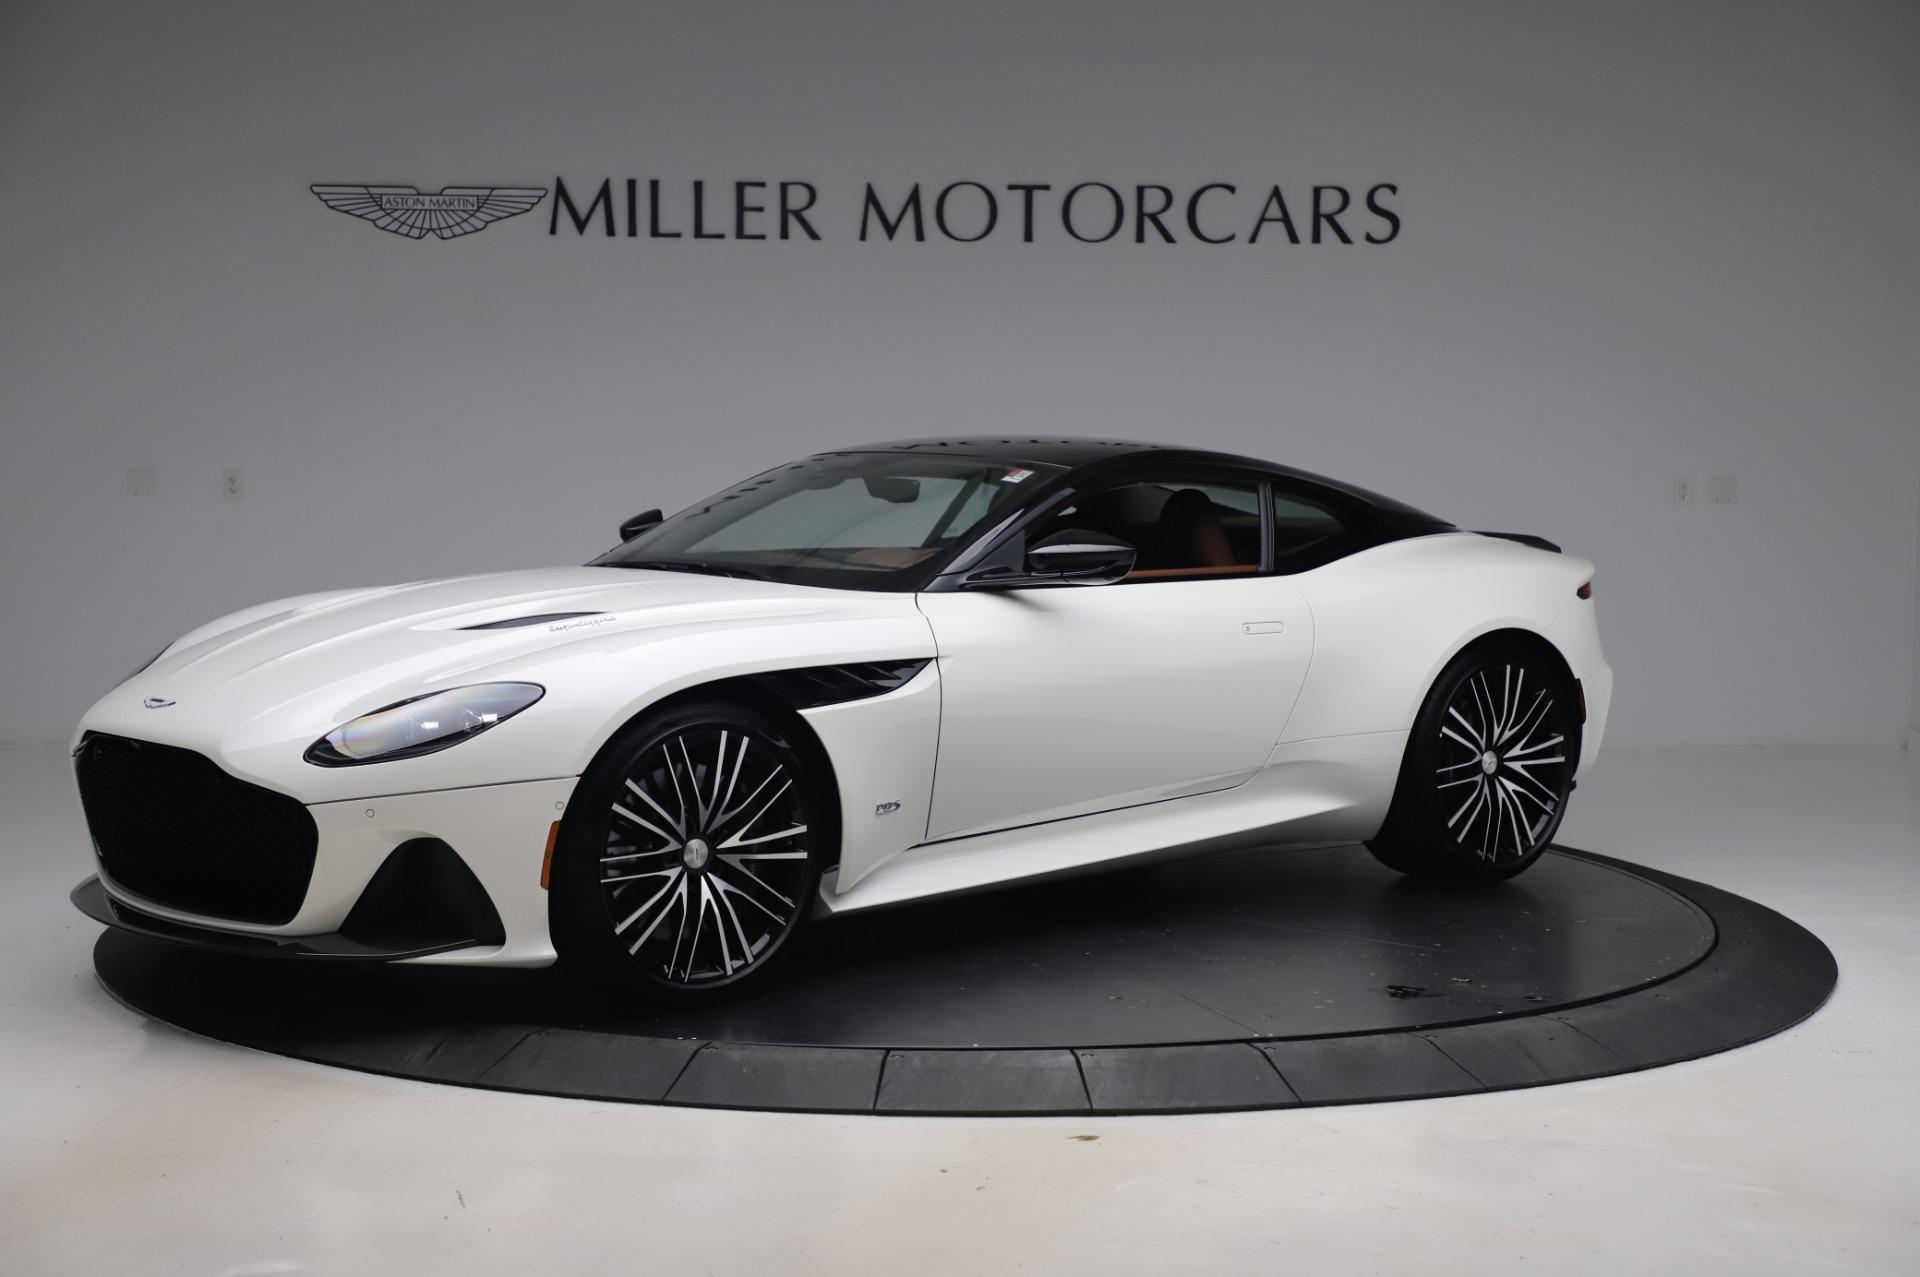 Used 2020 Aston Martin DBS Superleggera for sale $299,990 at Pagani of Greenwich in Greenwich CT 06830 1